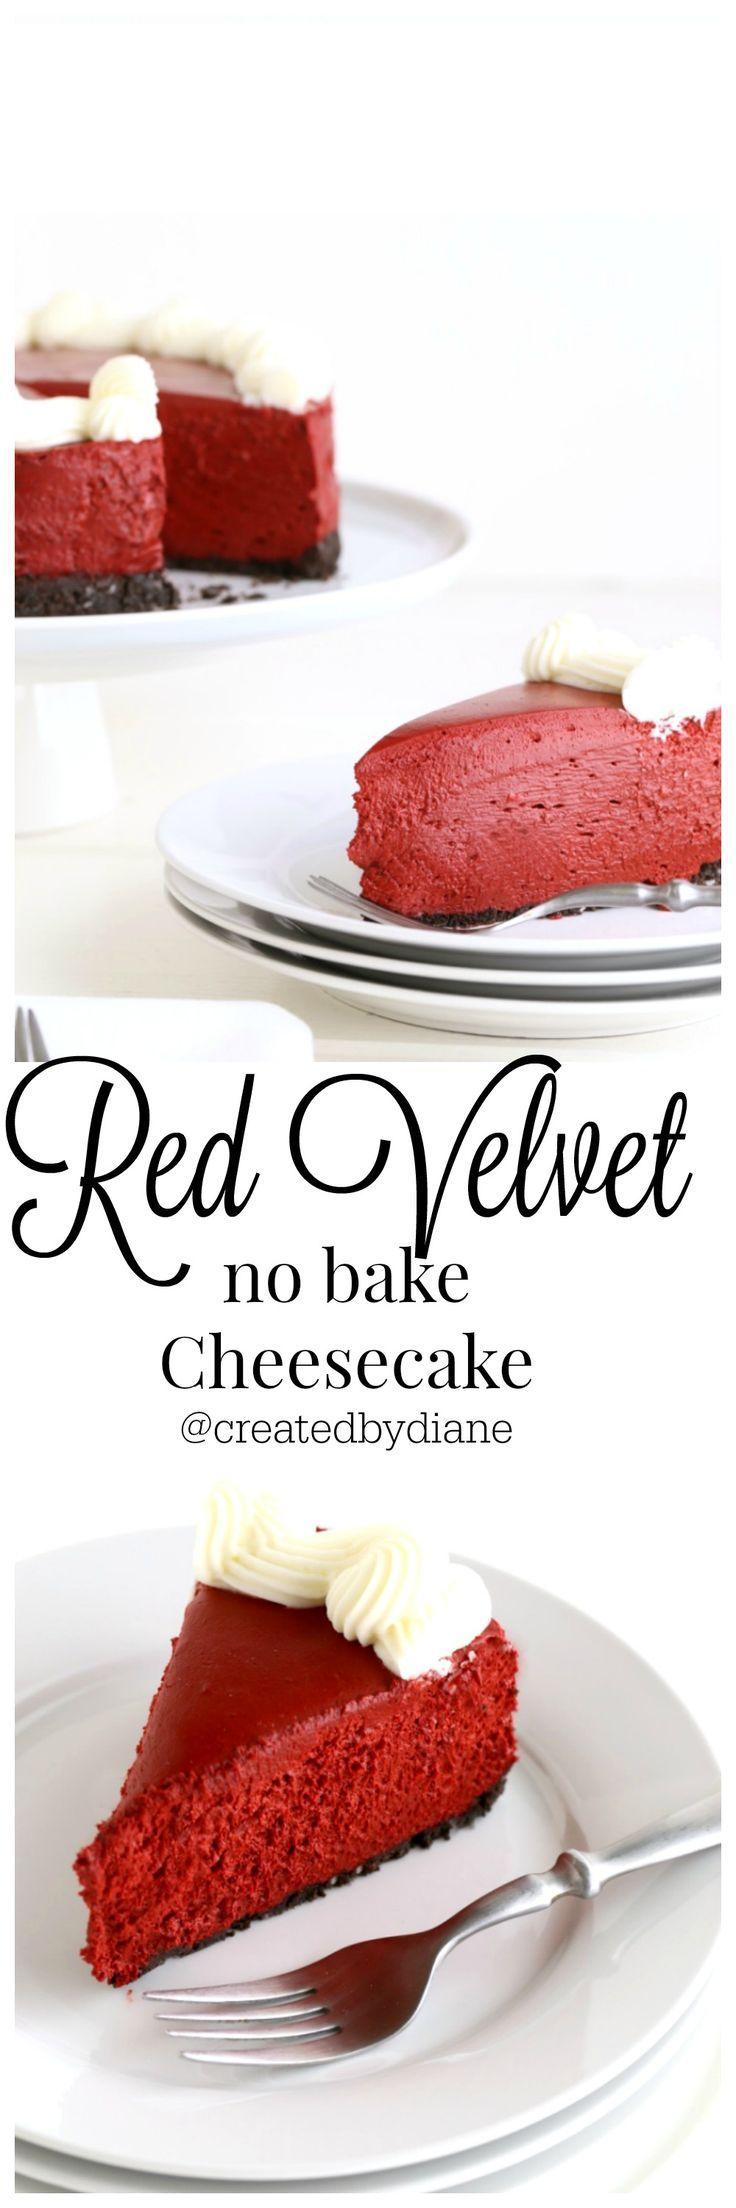 Red Velvet no bake Cheesecake from  /createdbydiane/